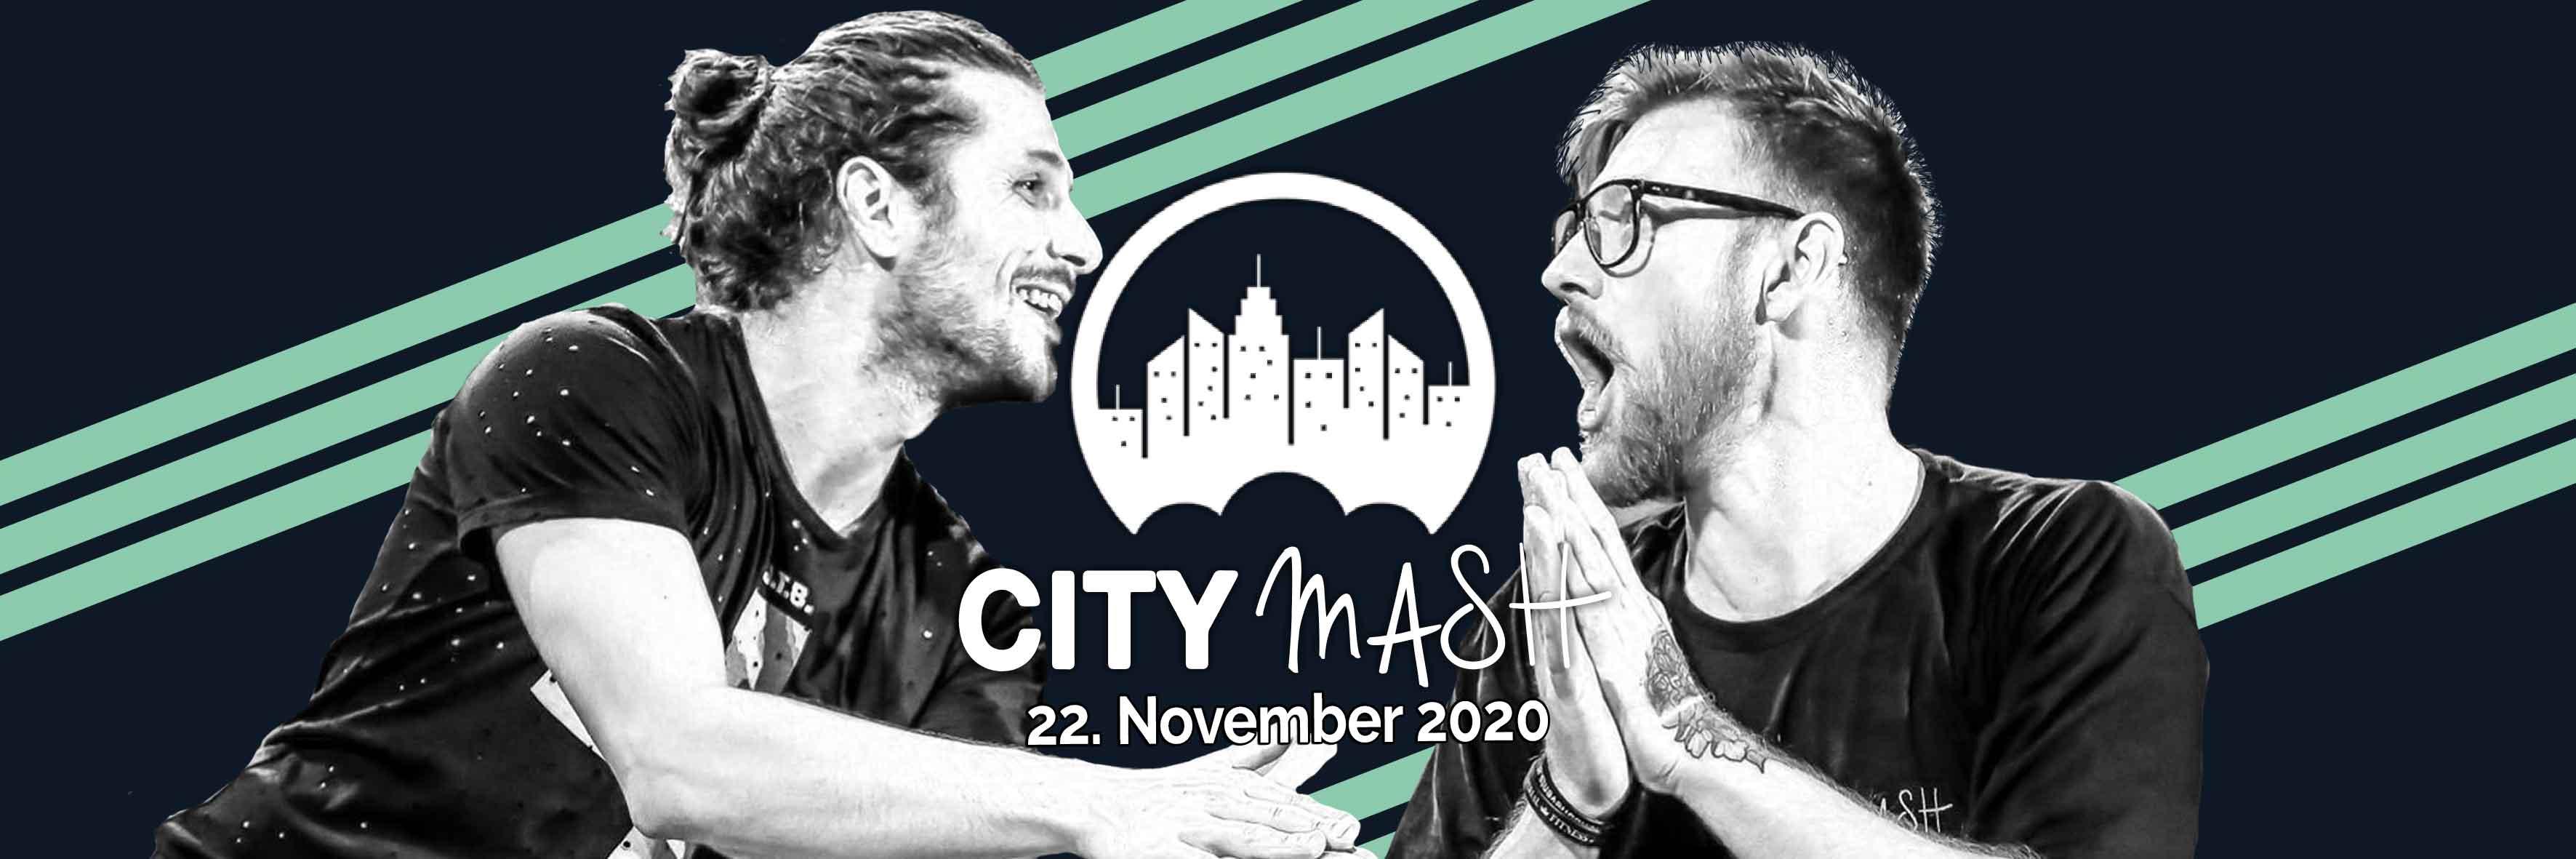 citymash-22.11.20